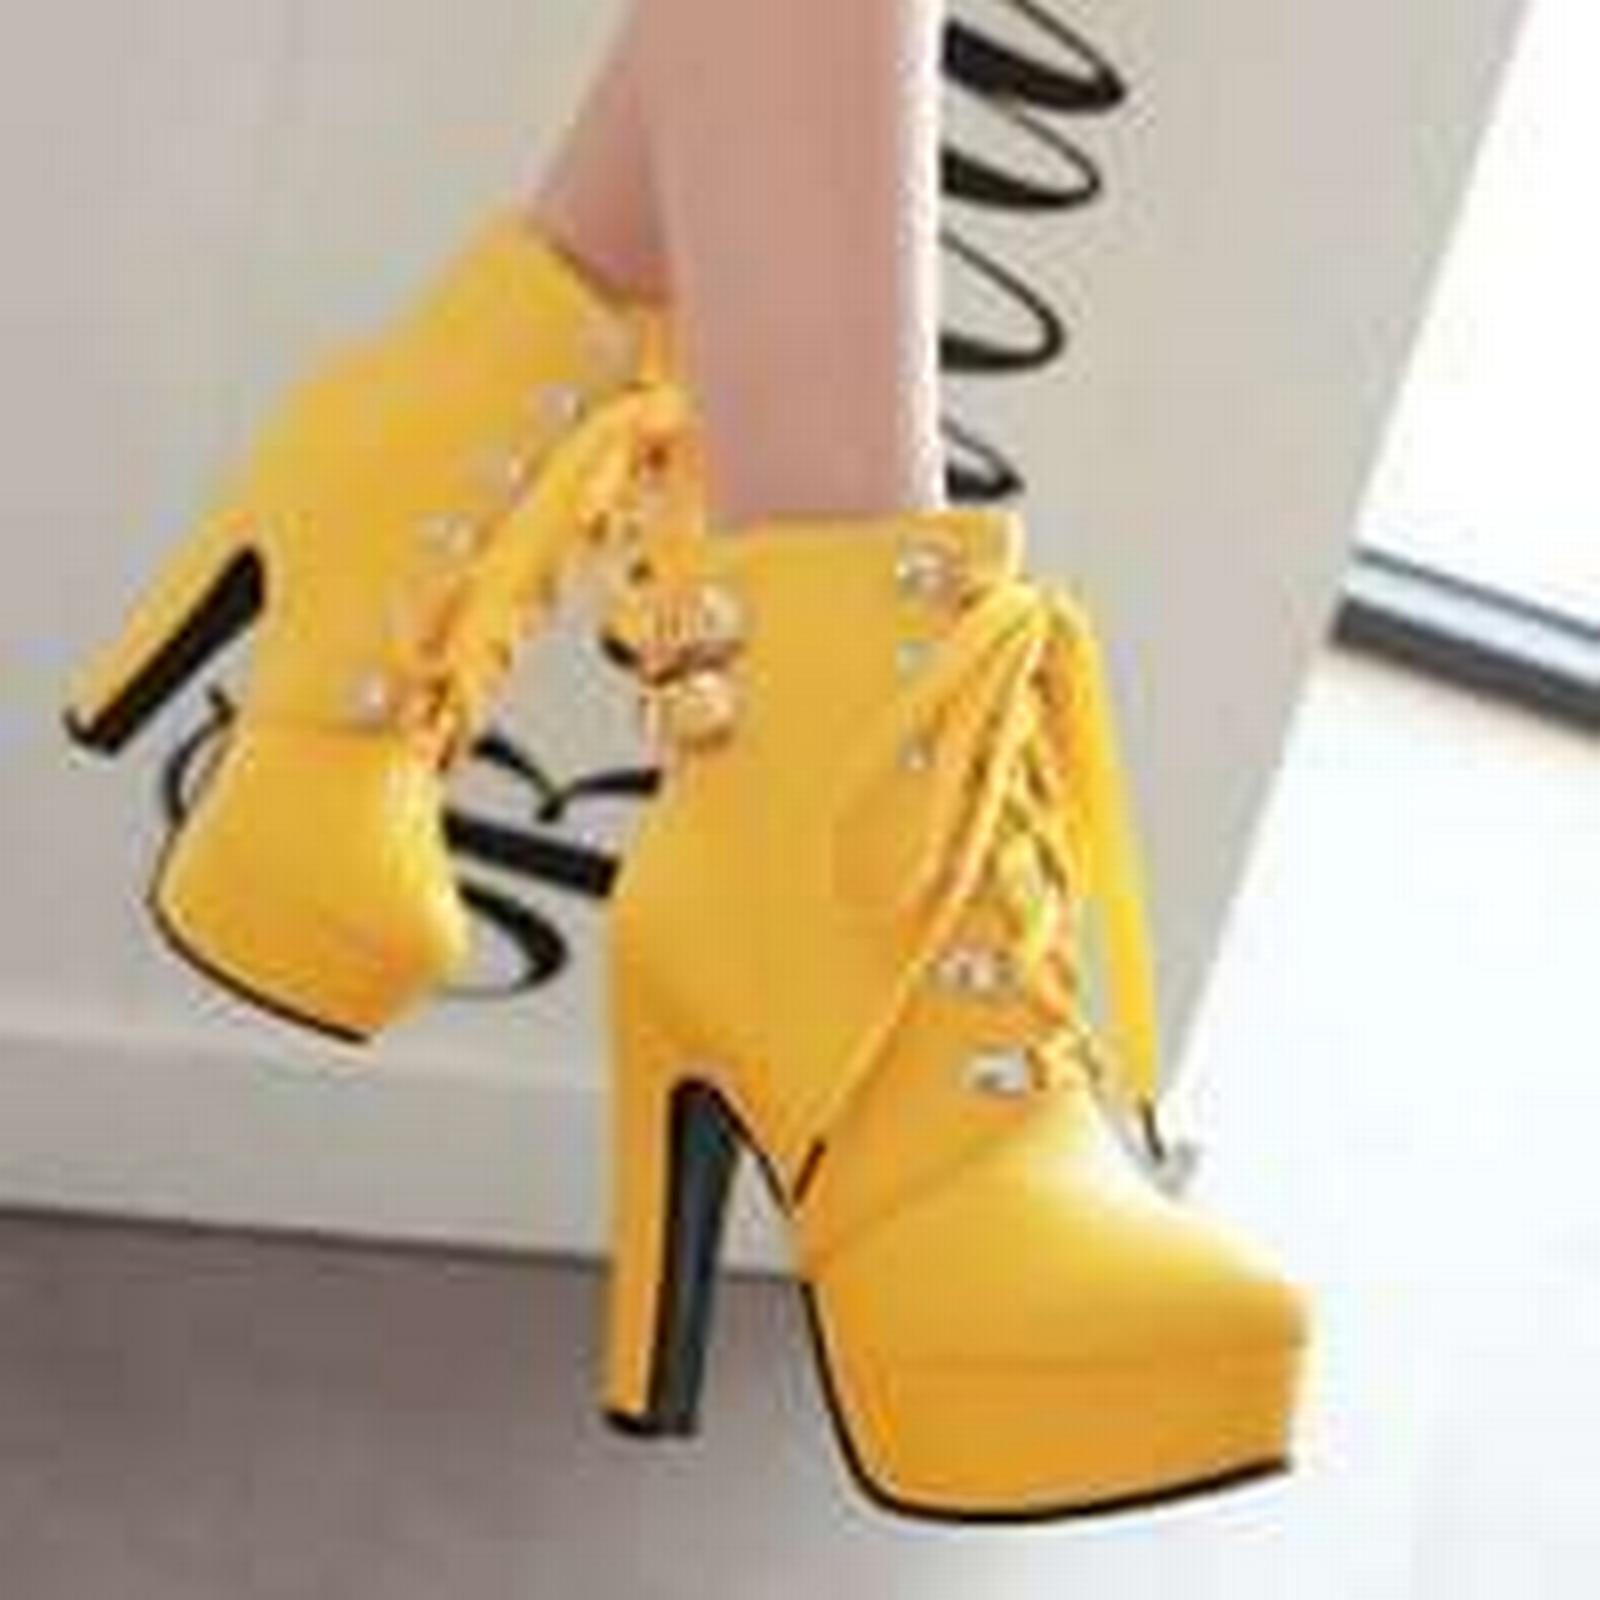 Bonanza (Global) PB106 Stunning 4-9, buckles booties,US size 4-9, Stunning yellow 4b49b1